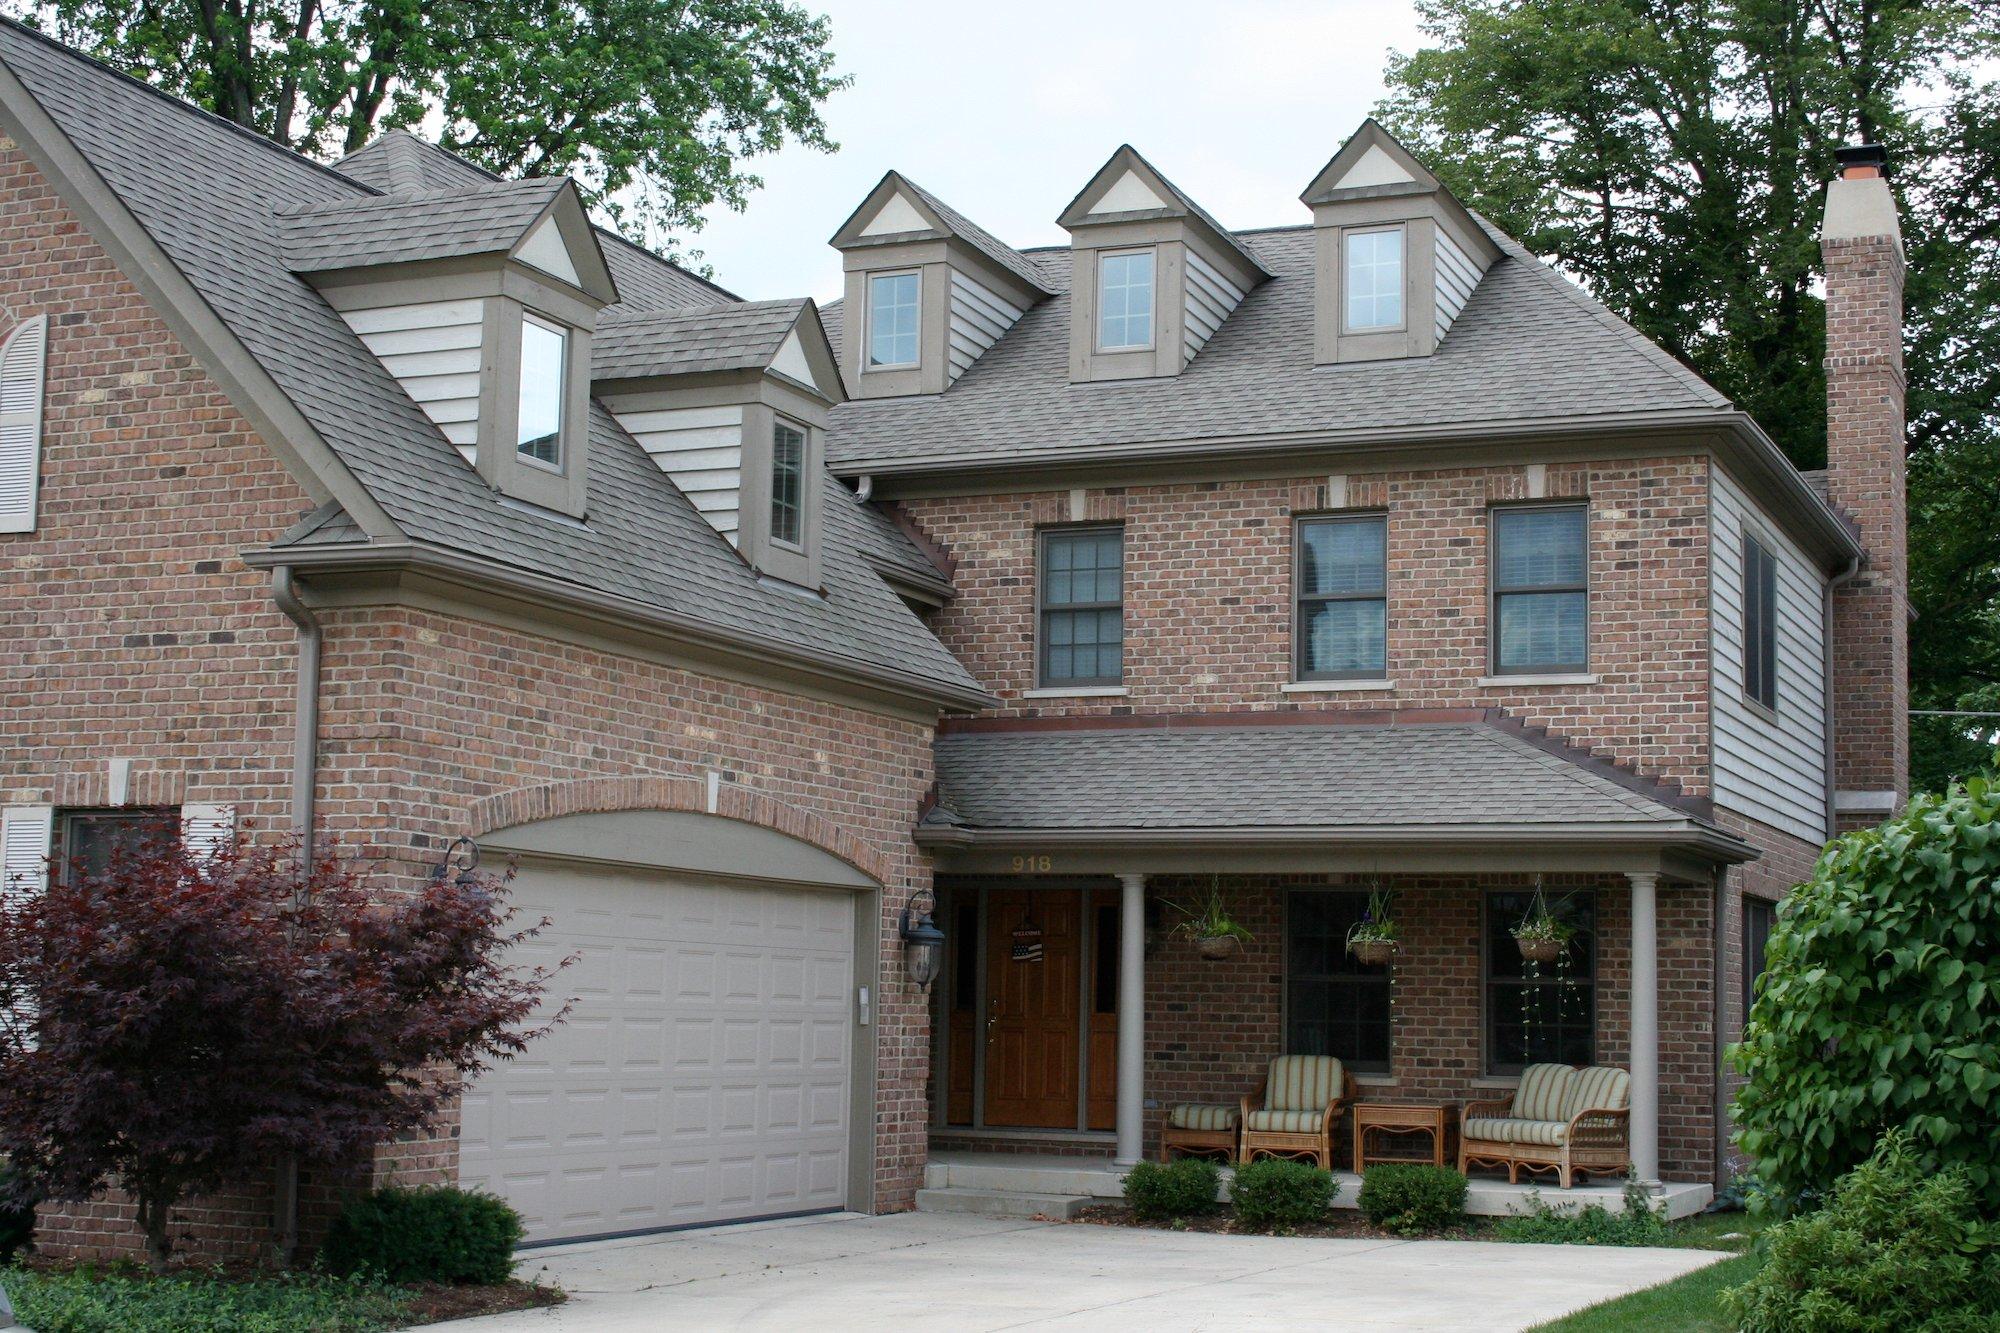 design-build-remodeling-chicago-northwest-suburbs-barrington-arlington-heights